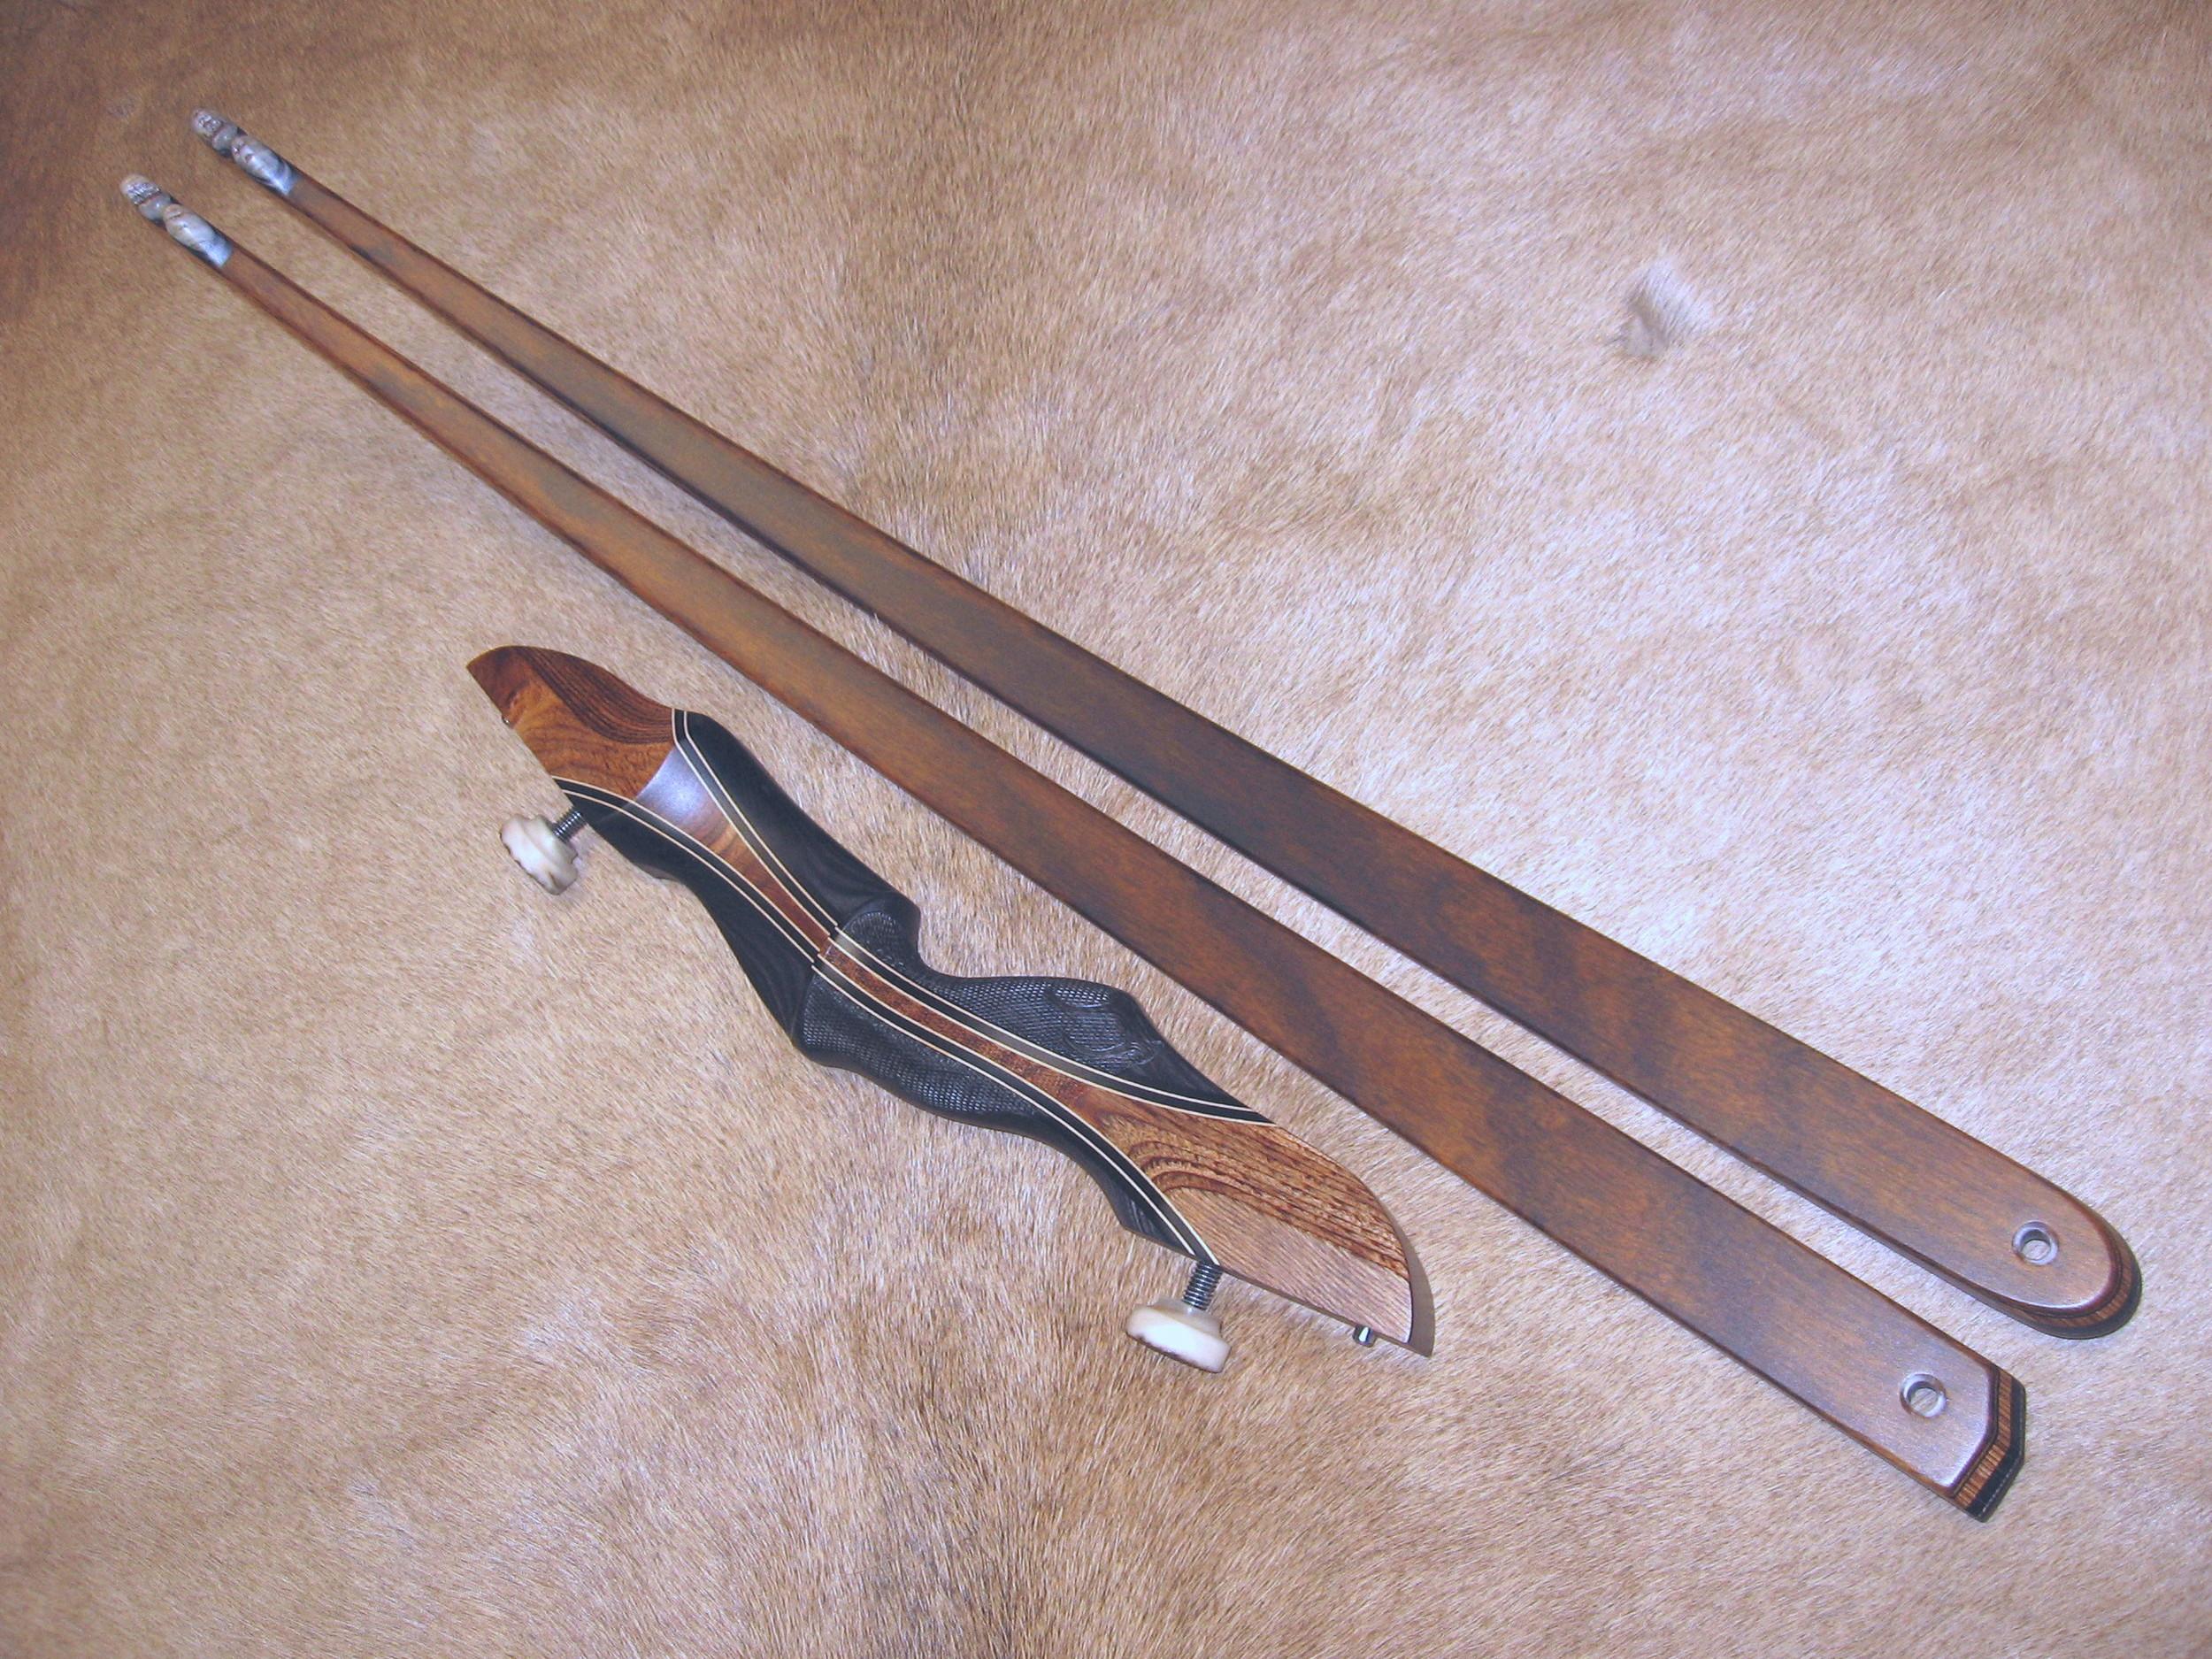 Charcoal Dym Riser w/ Charcoal Dym Flare- Zebrawood Limbs